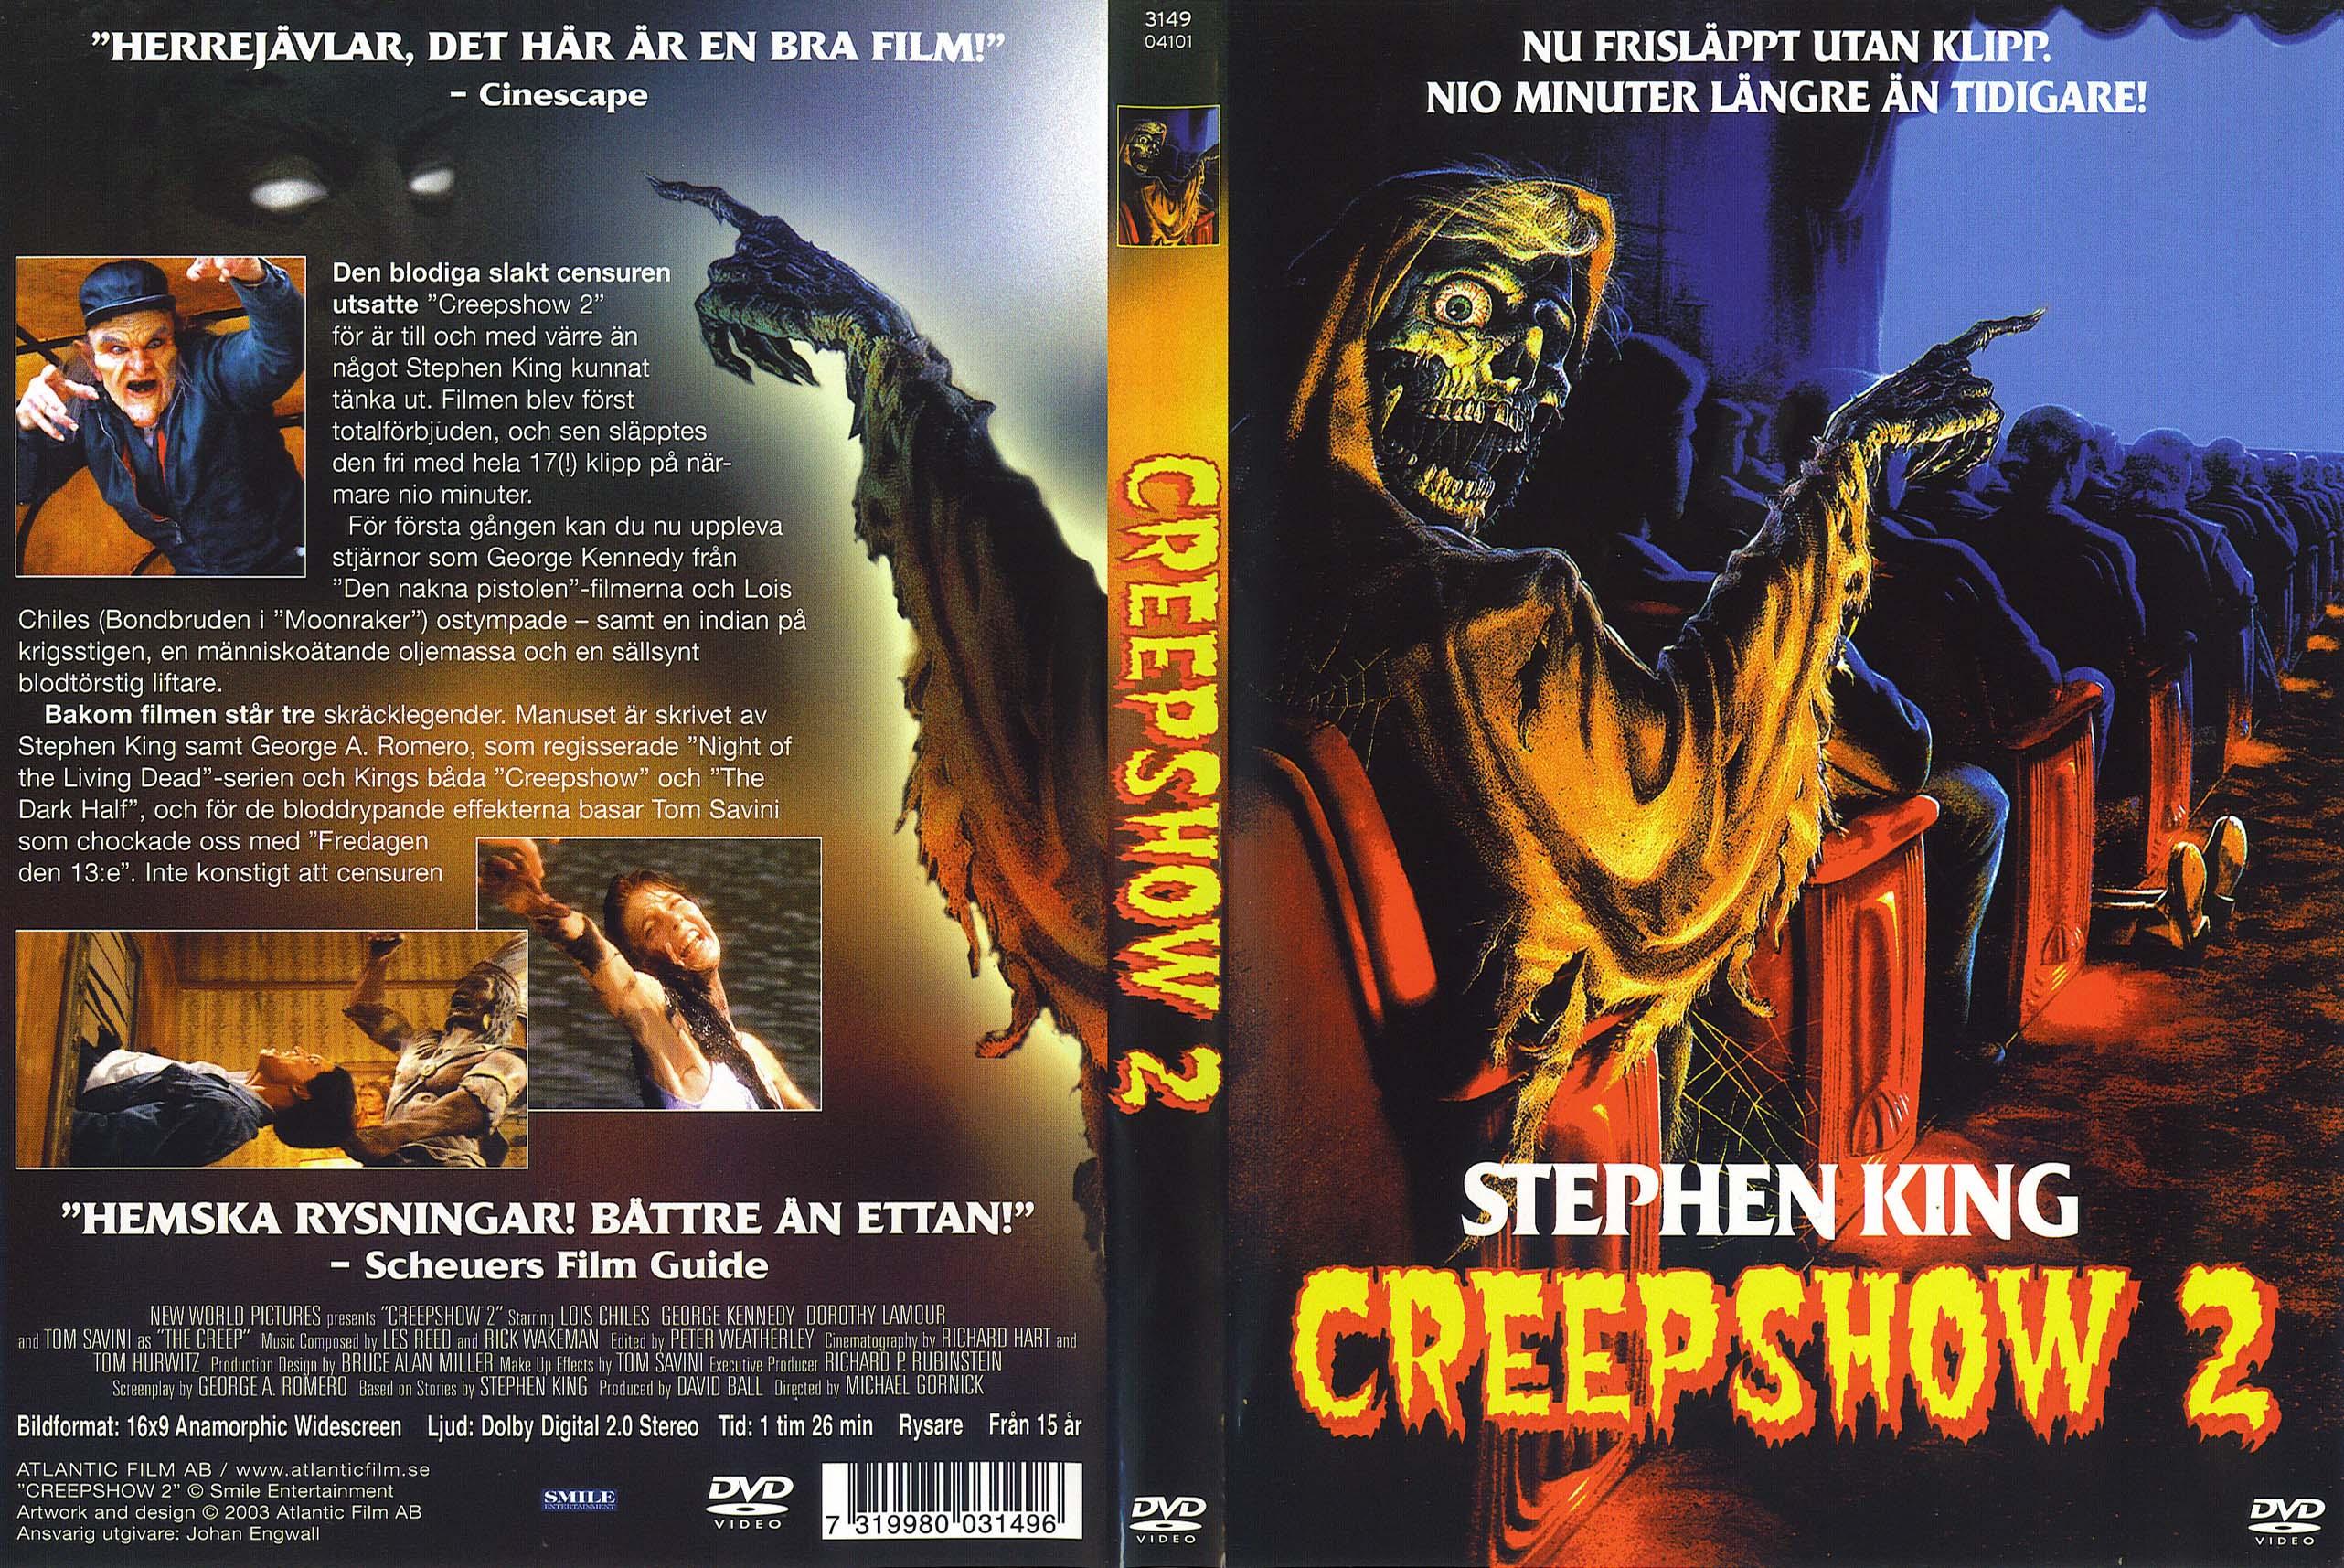 Creepshow 2 The Raft Creepshow 2